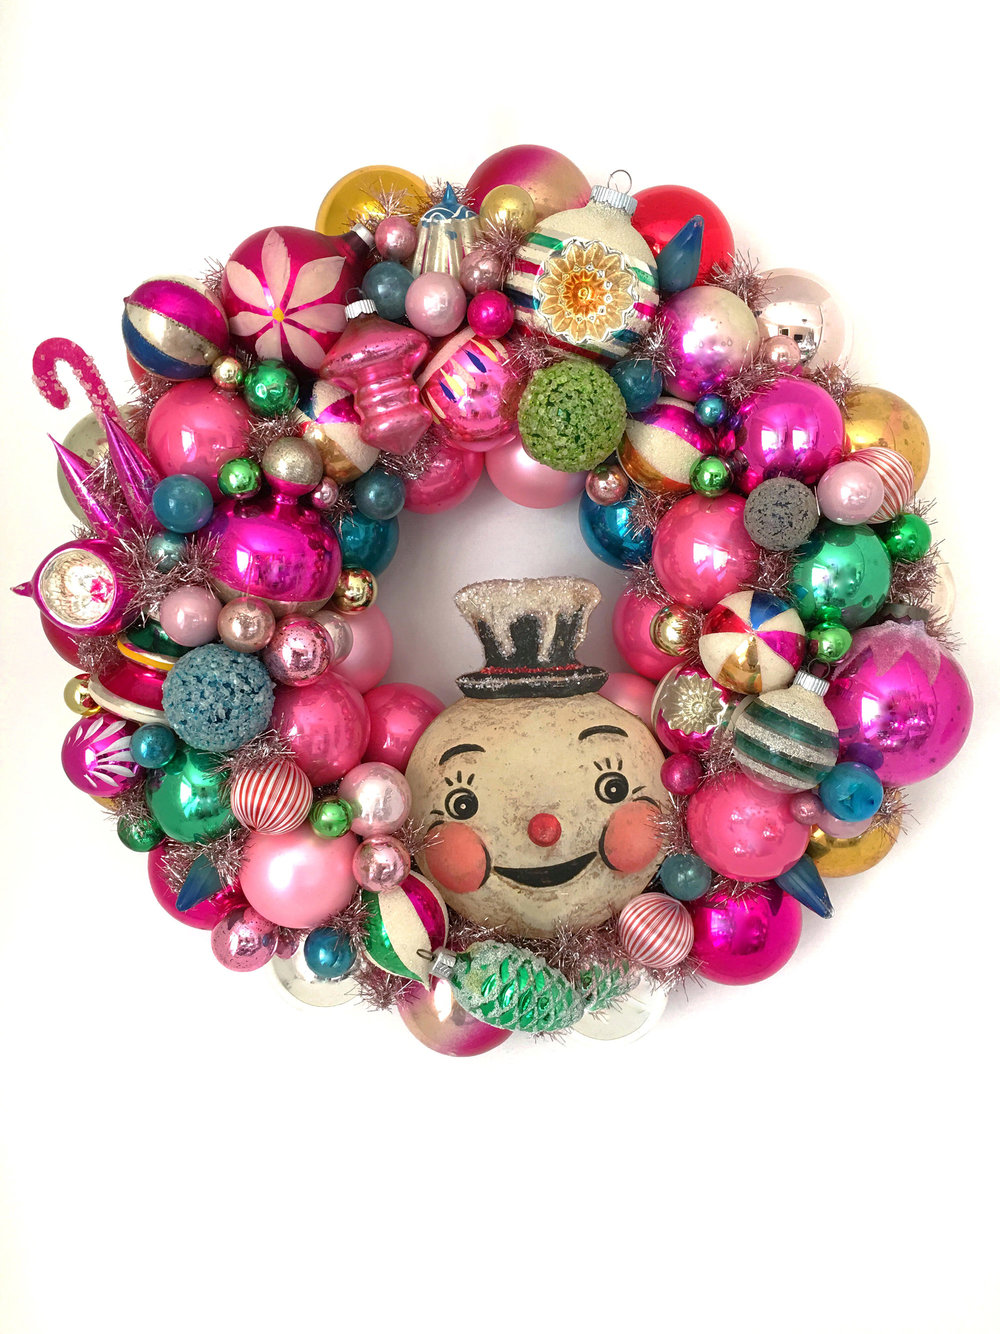 Bubble-Gum-Bauble-Vintage-Wreath-on-White-Christmas-Studio-Johanna-Parker.jpg